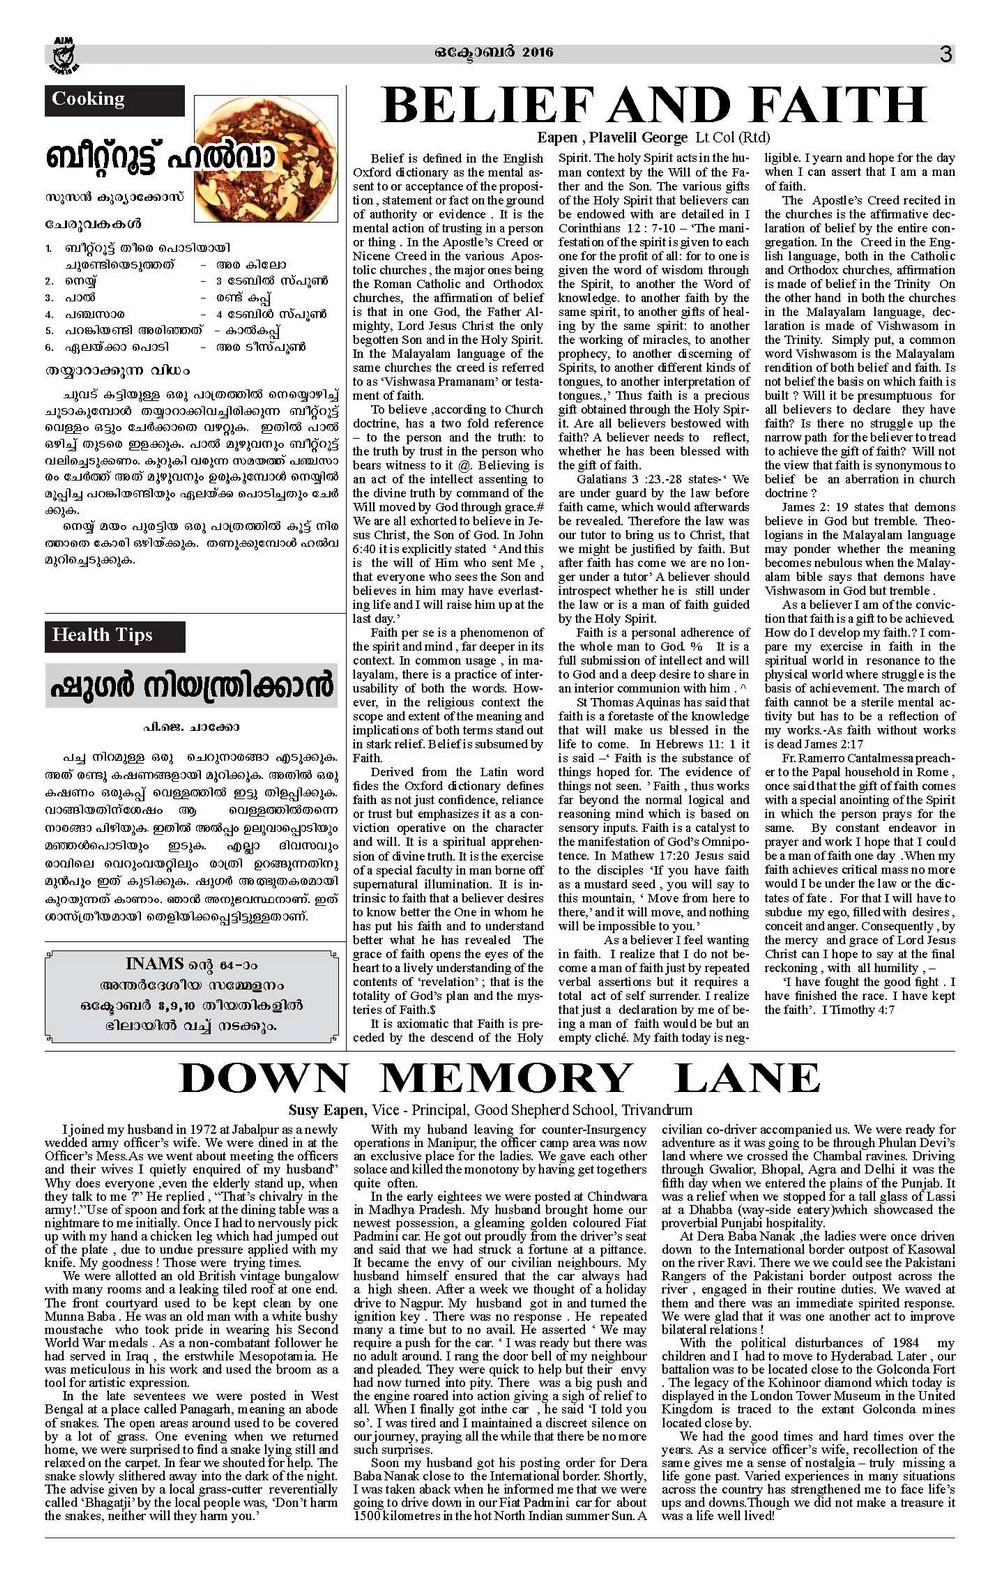 aim-oct-16-internet-edn_page_3